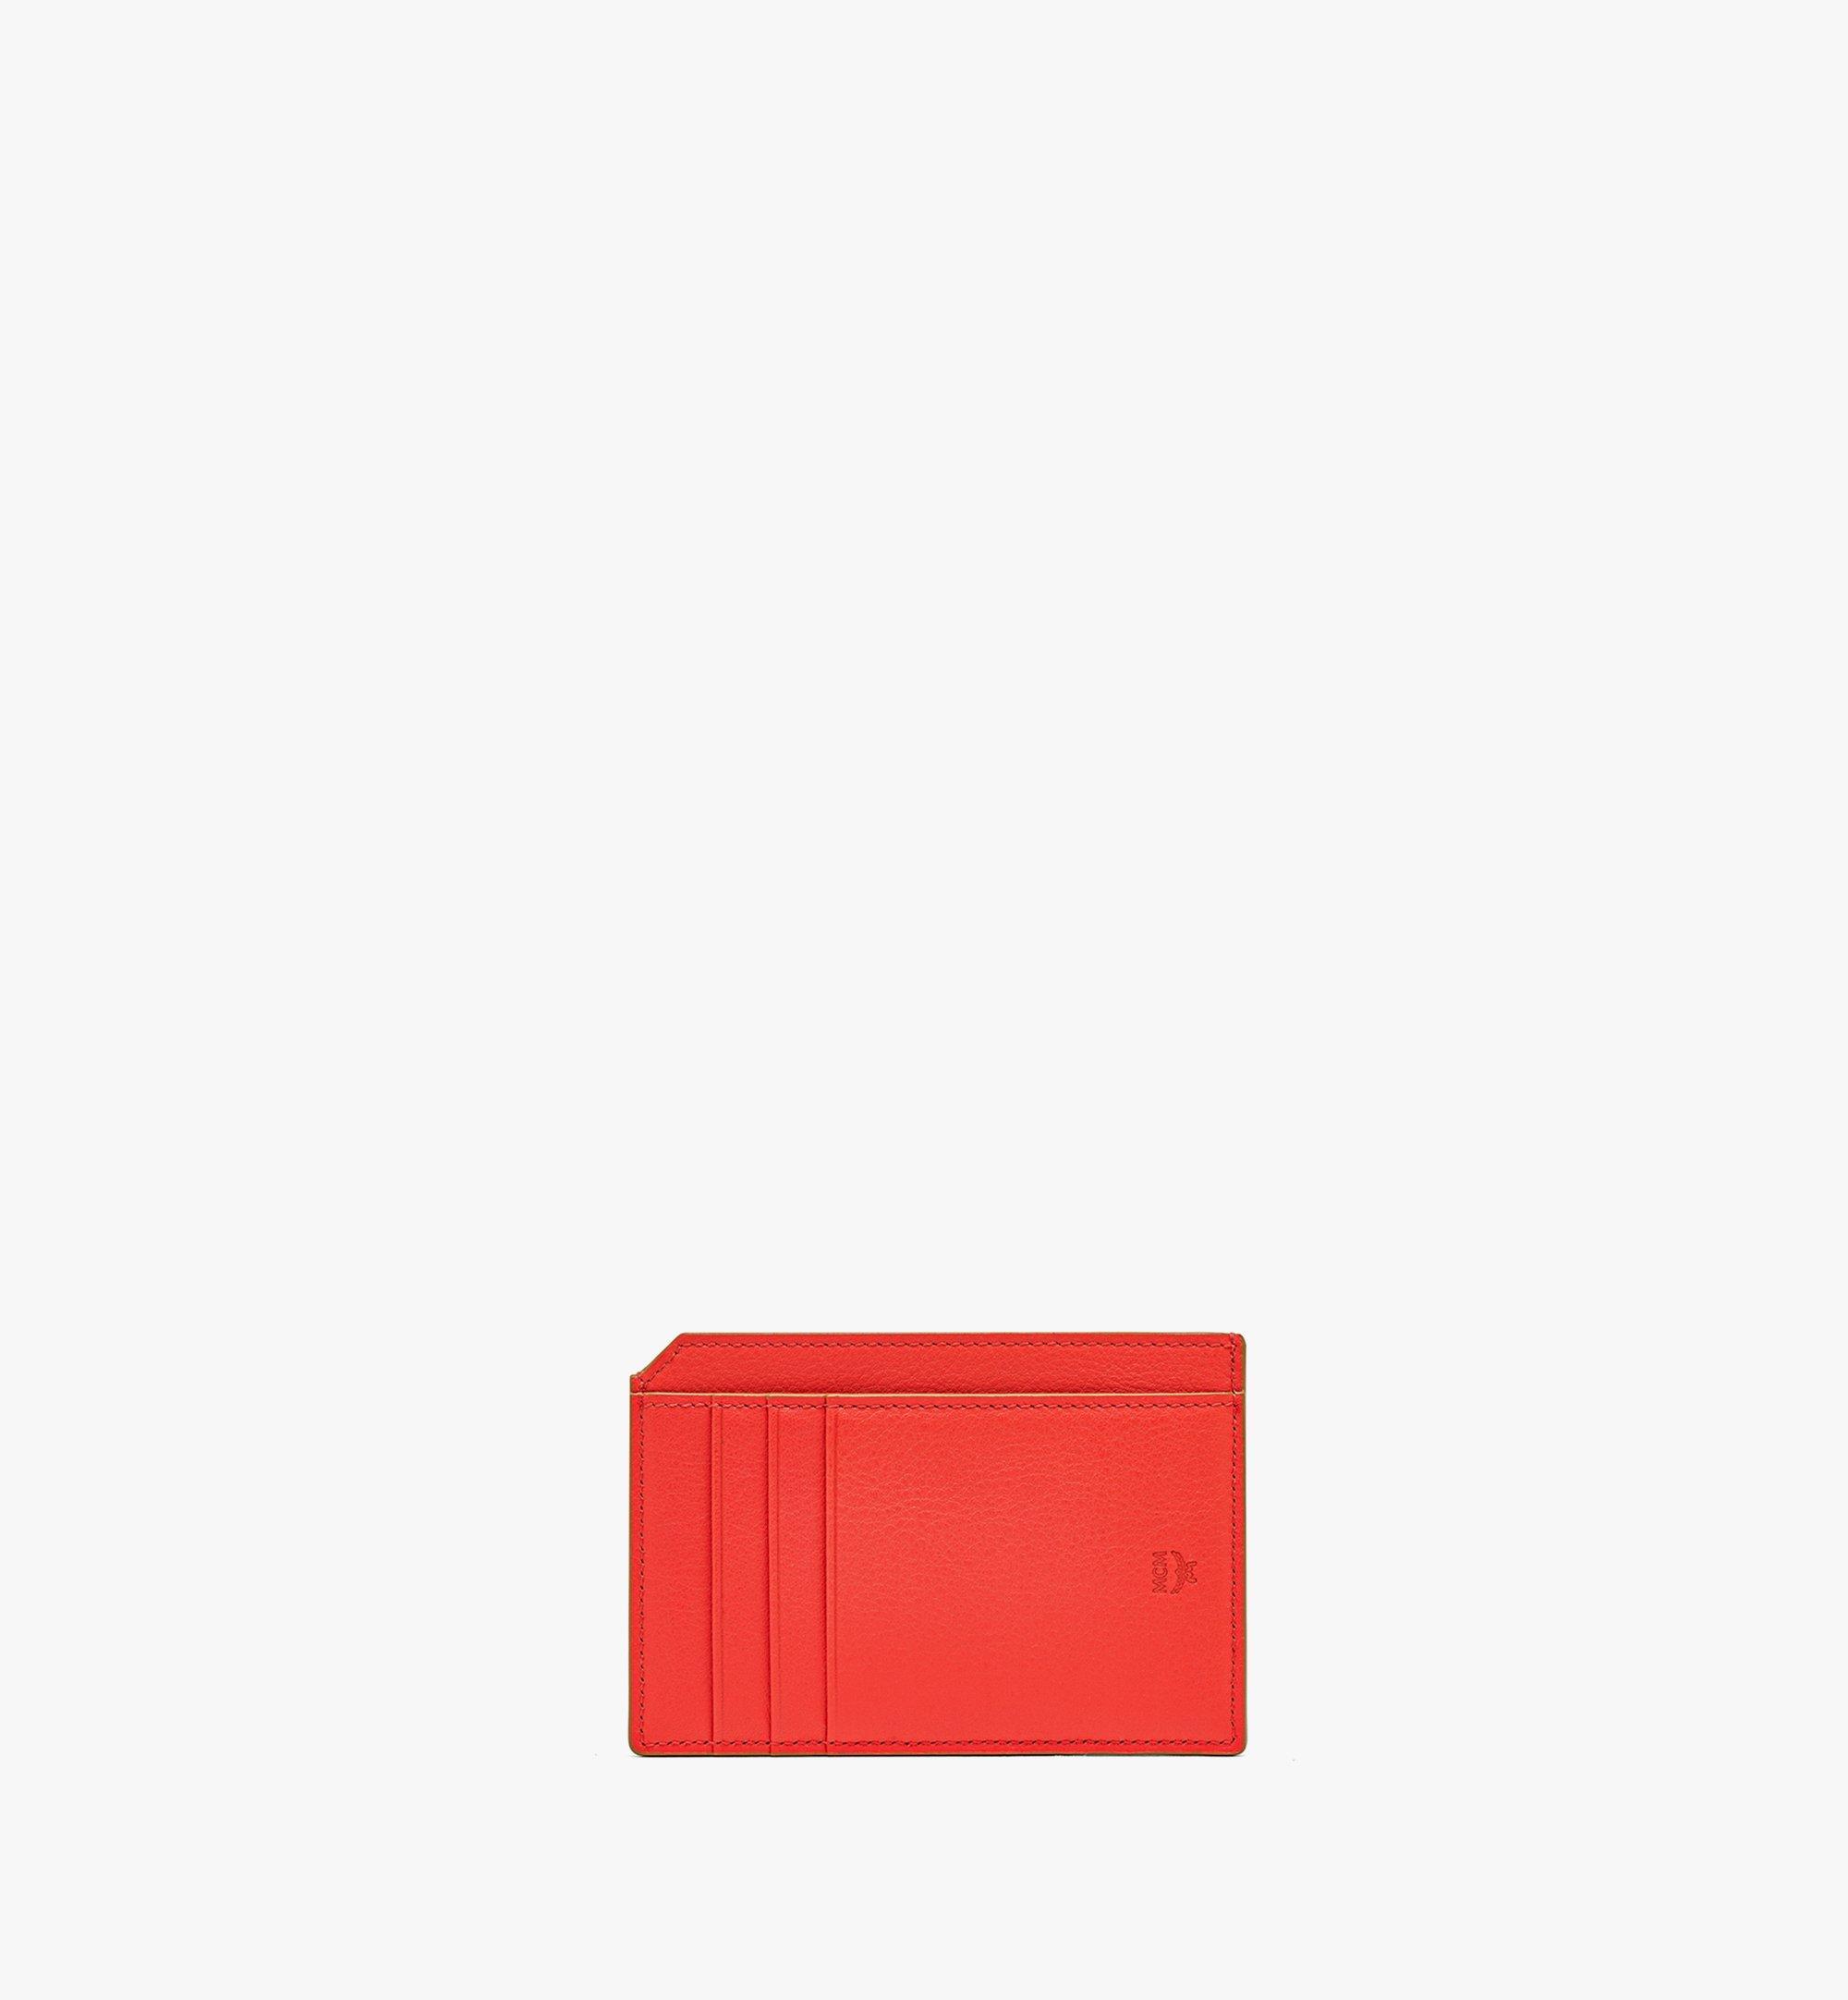 MCM Klara Multifunction Card Holder in Monogram Leather Red MYABSKM01R8001 Alternate View 2